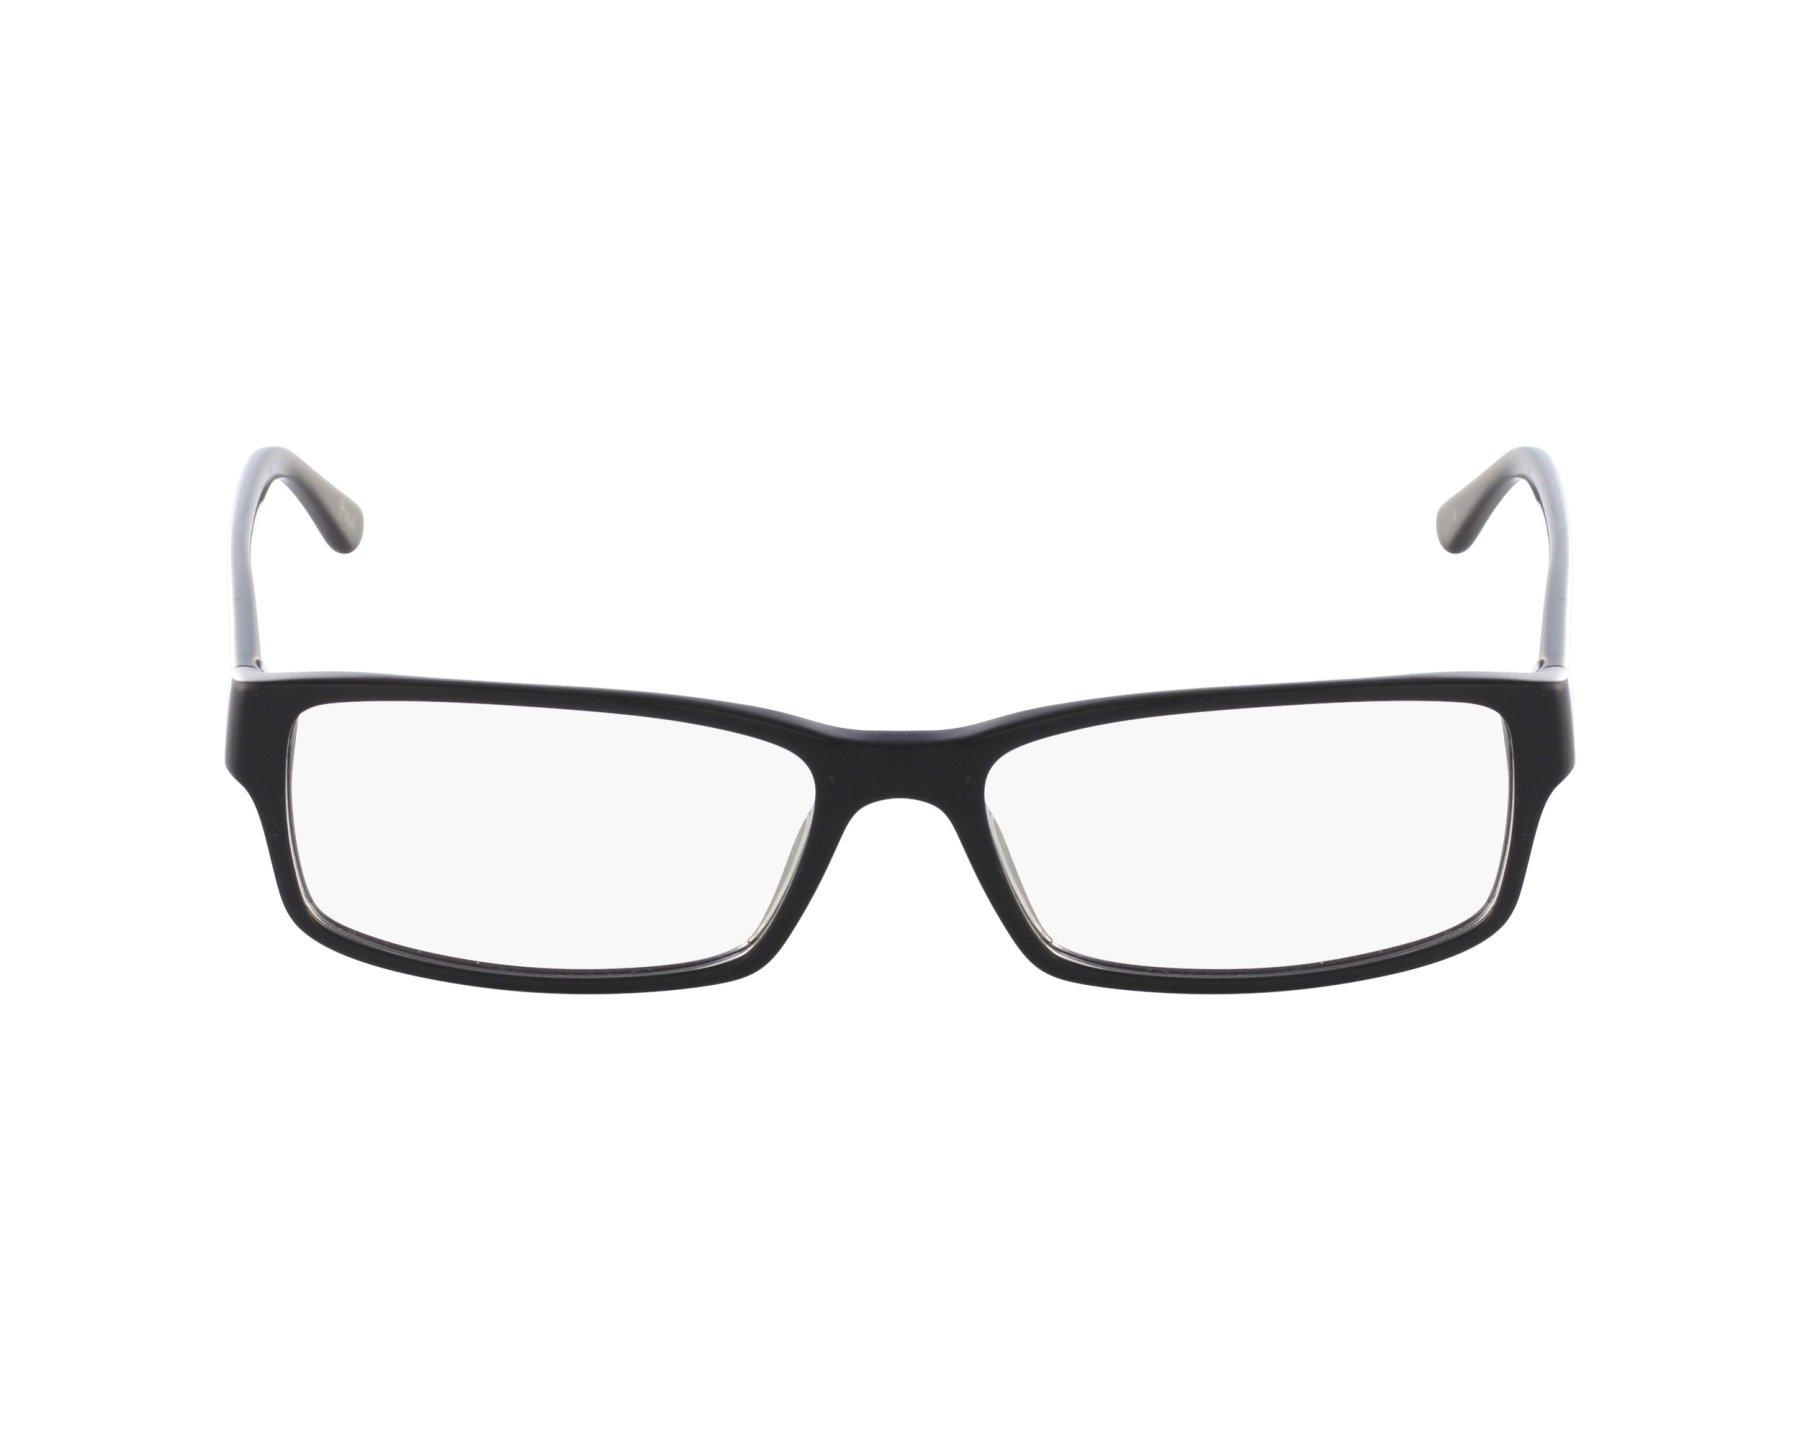 Polo Ralph Lauren Brillen Polo 2065 5001 1fX0D8gW0T